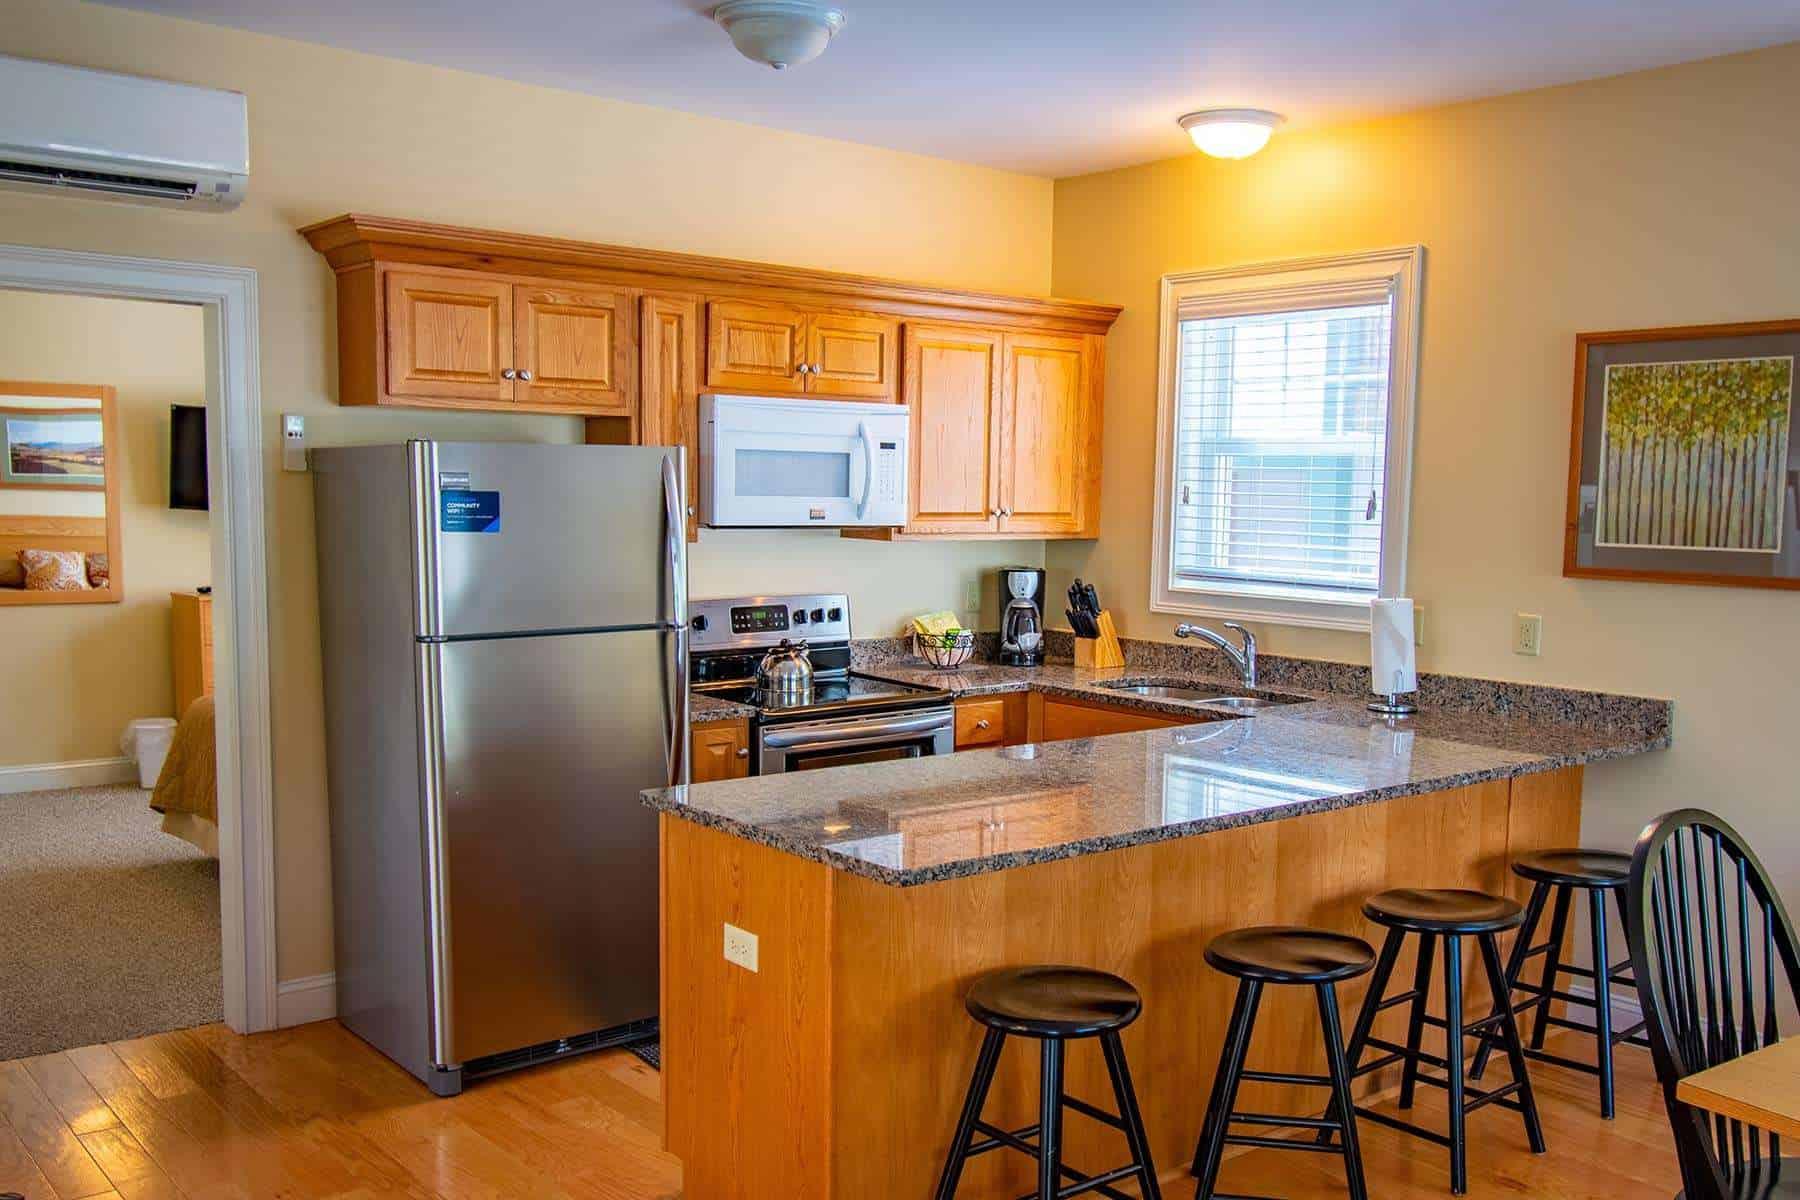 Deluxe 1 Bedroom Kitchen E156 WW